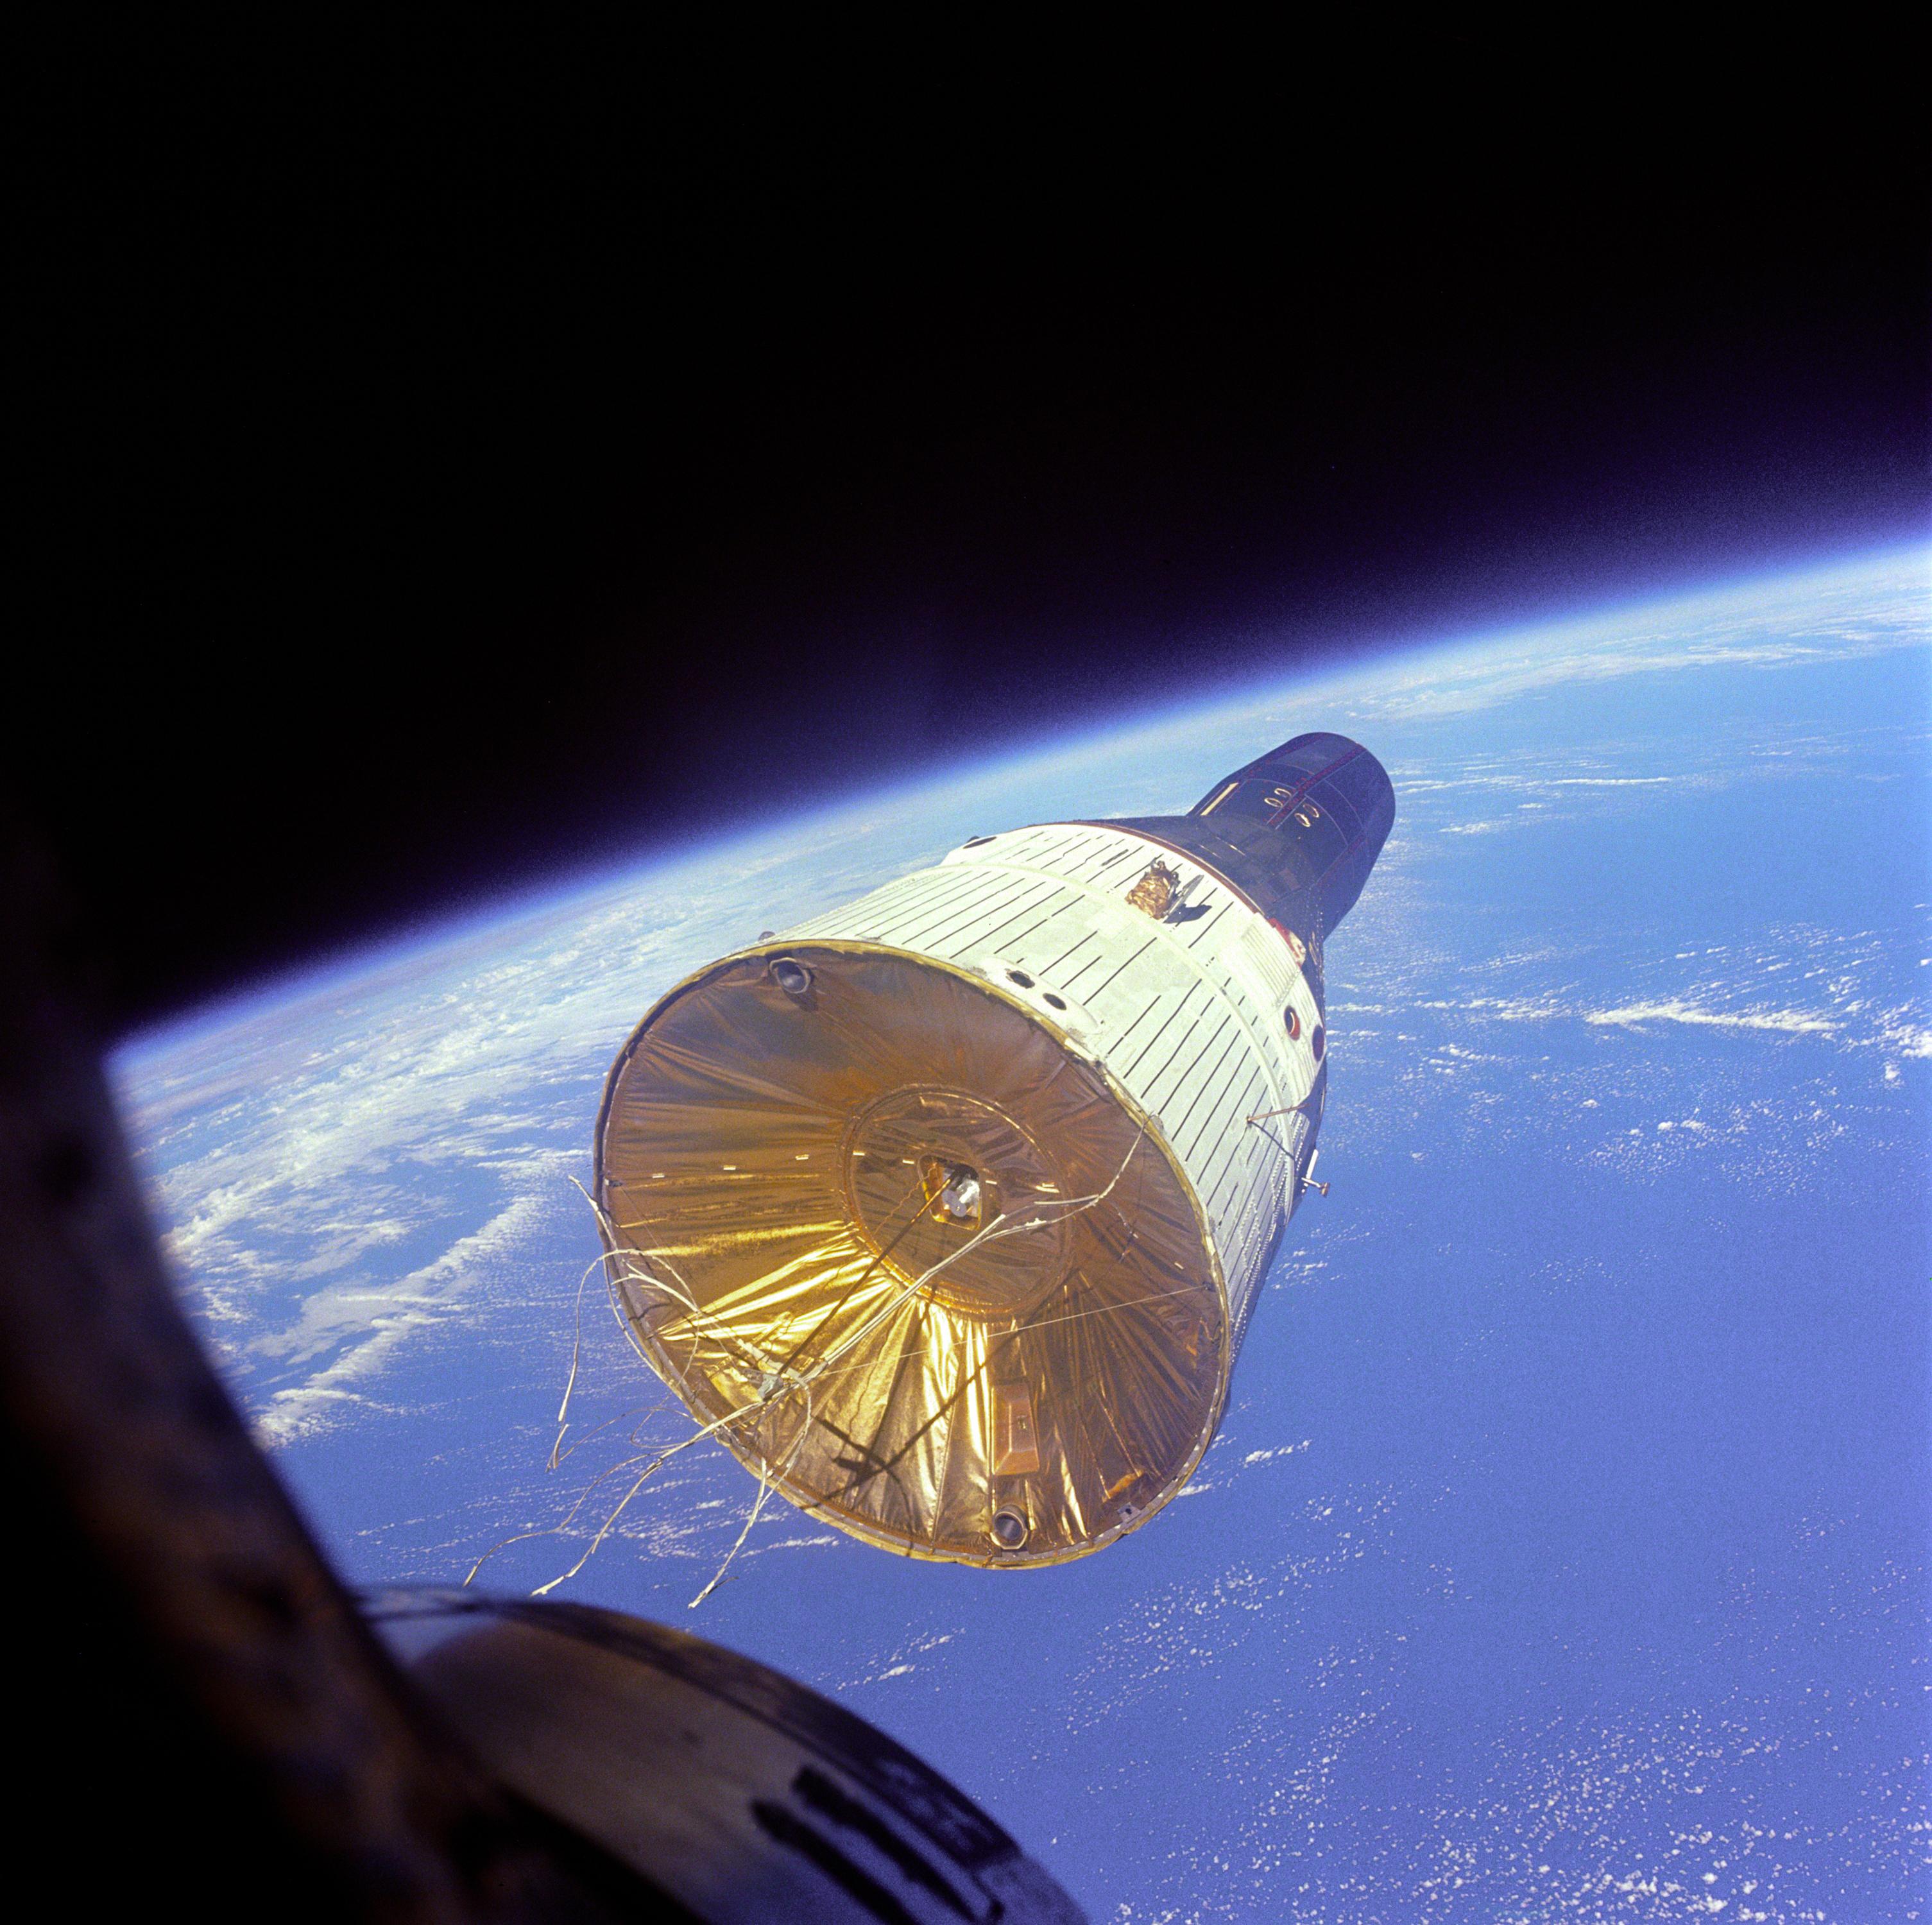 gemini space program history - photo #20